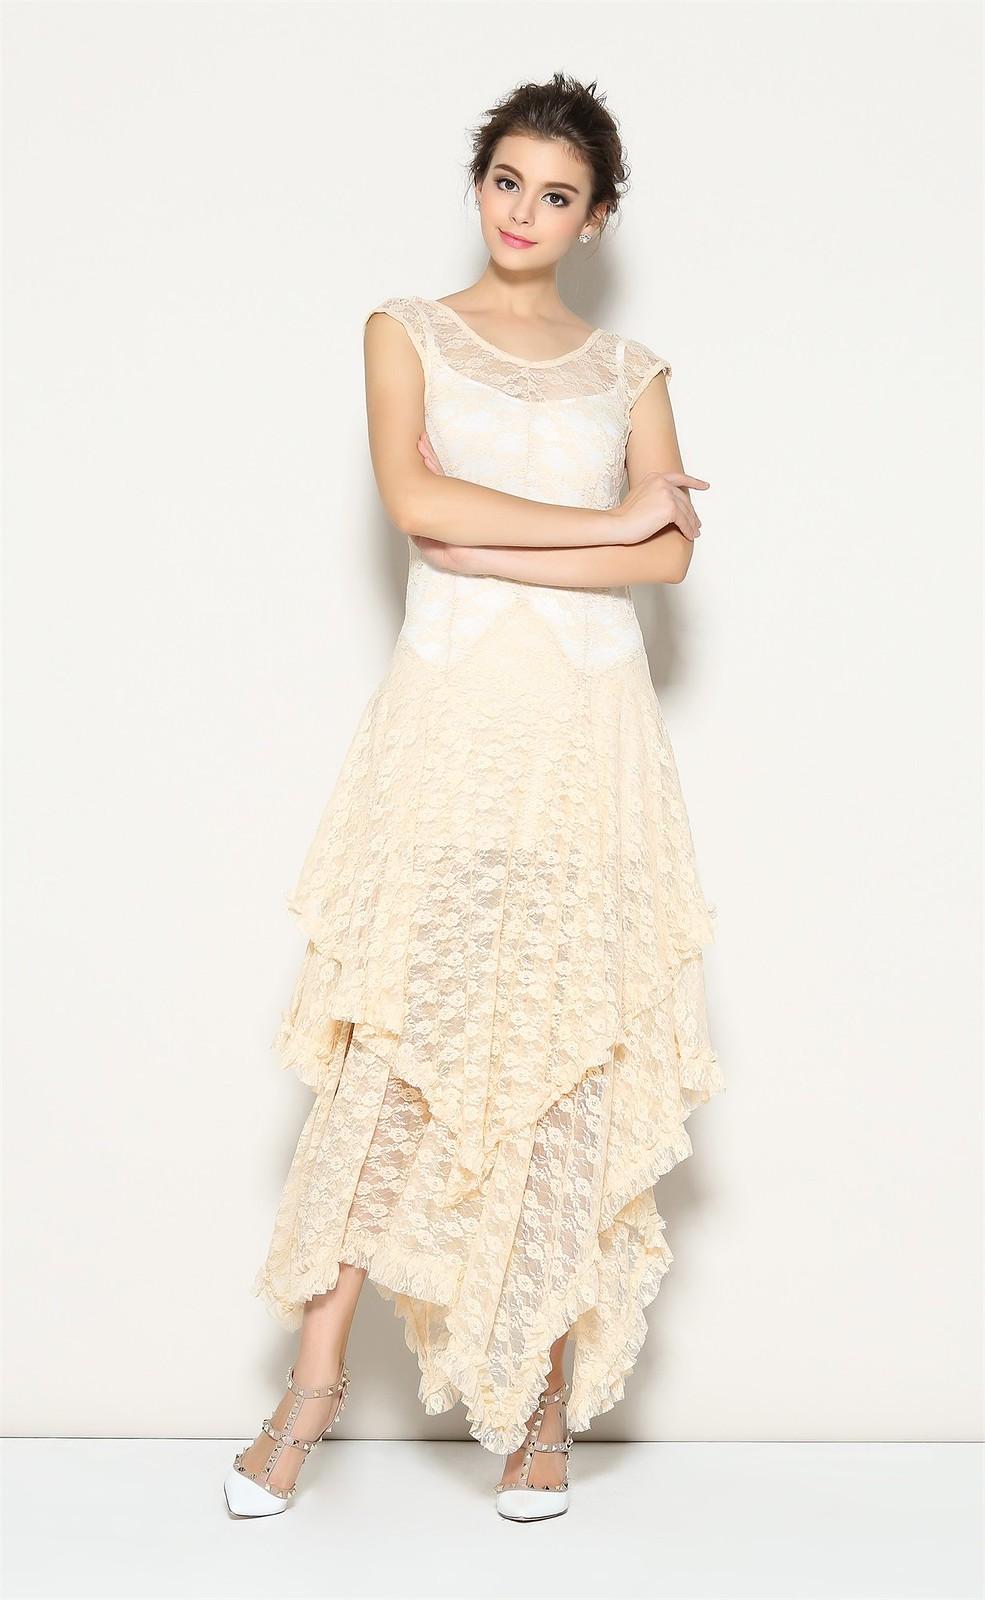 R W Co Bridesmaid Dresses - Flower Girl